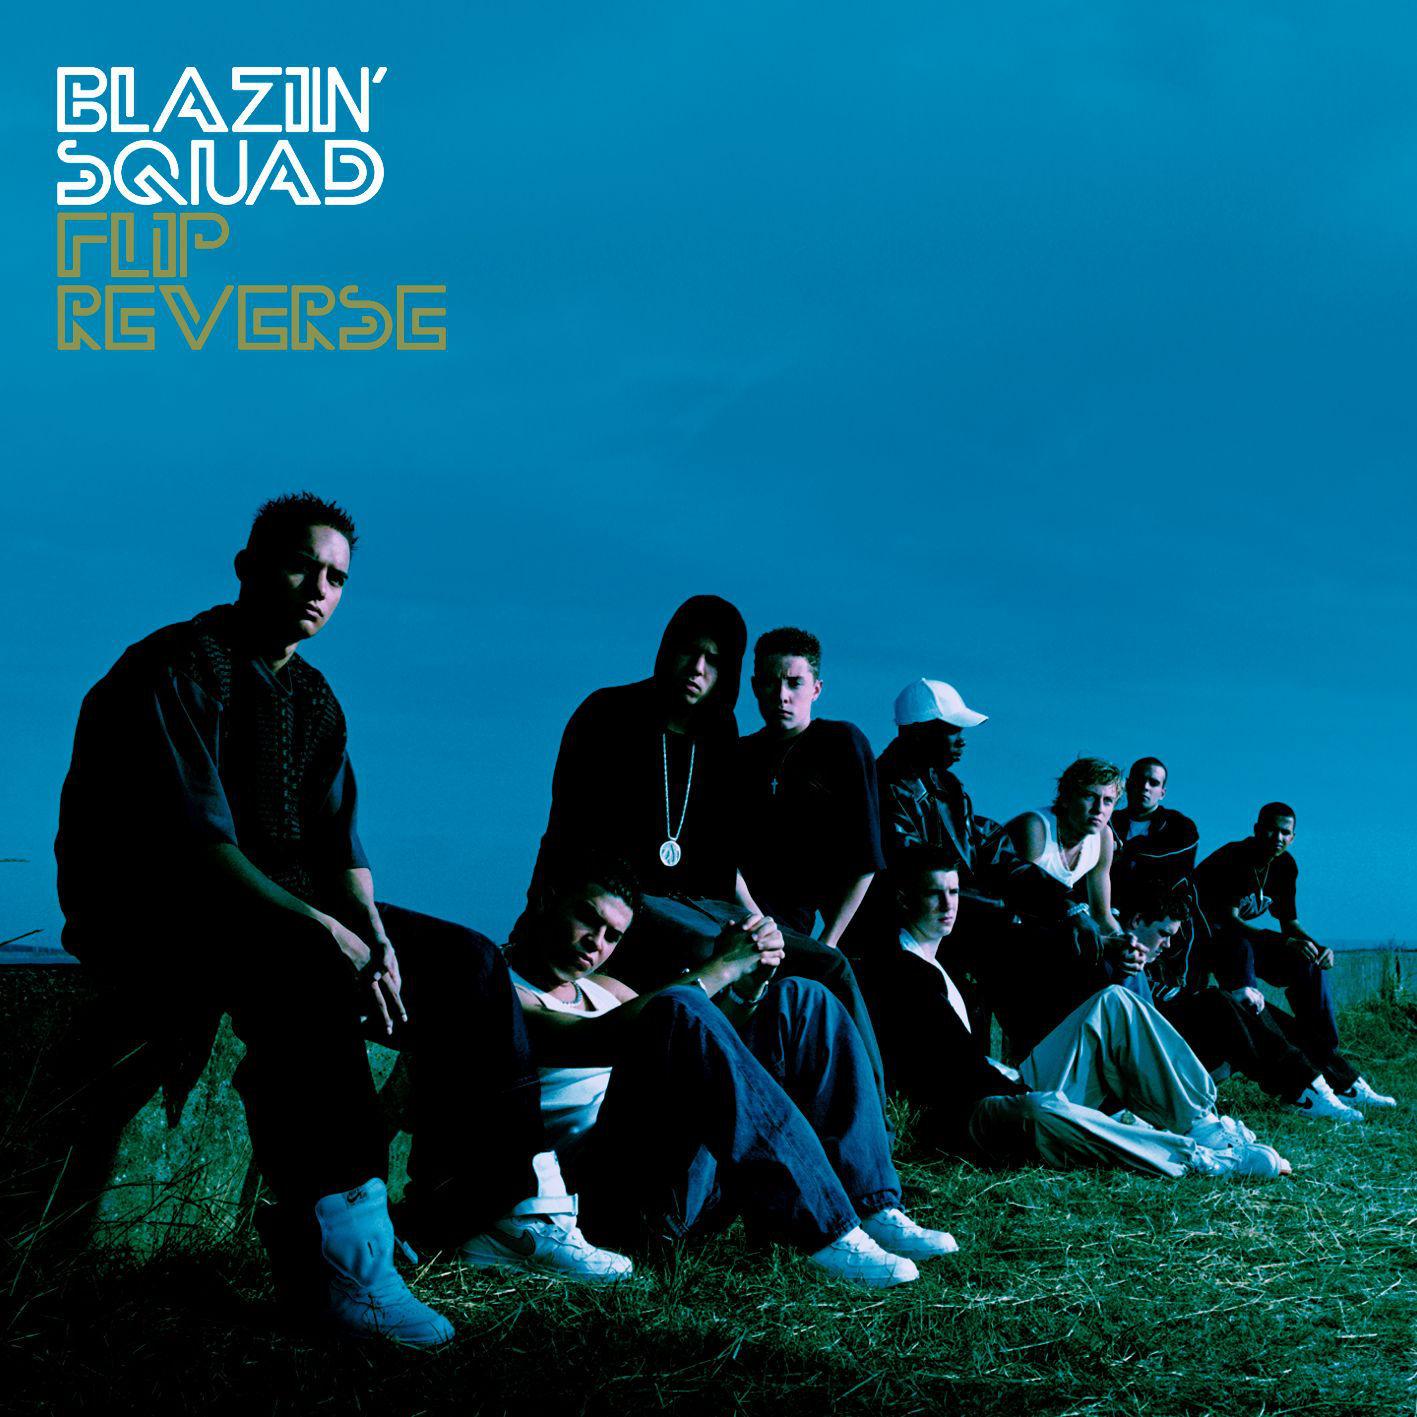 Blazin Squad Flip Reverse